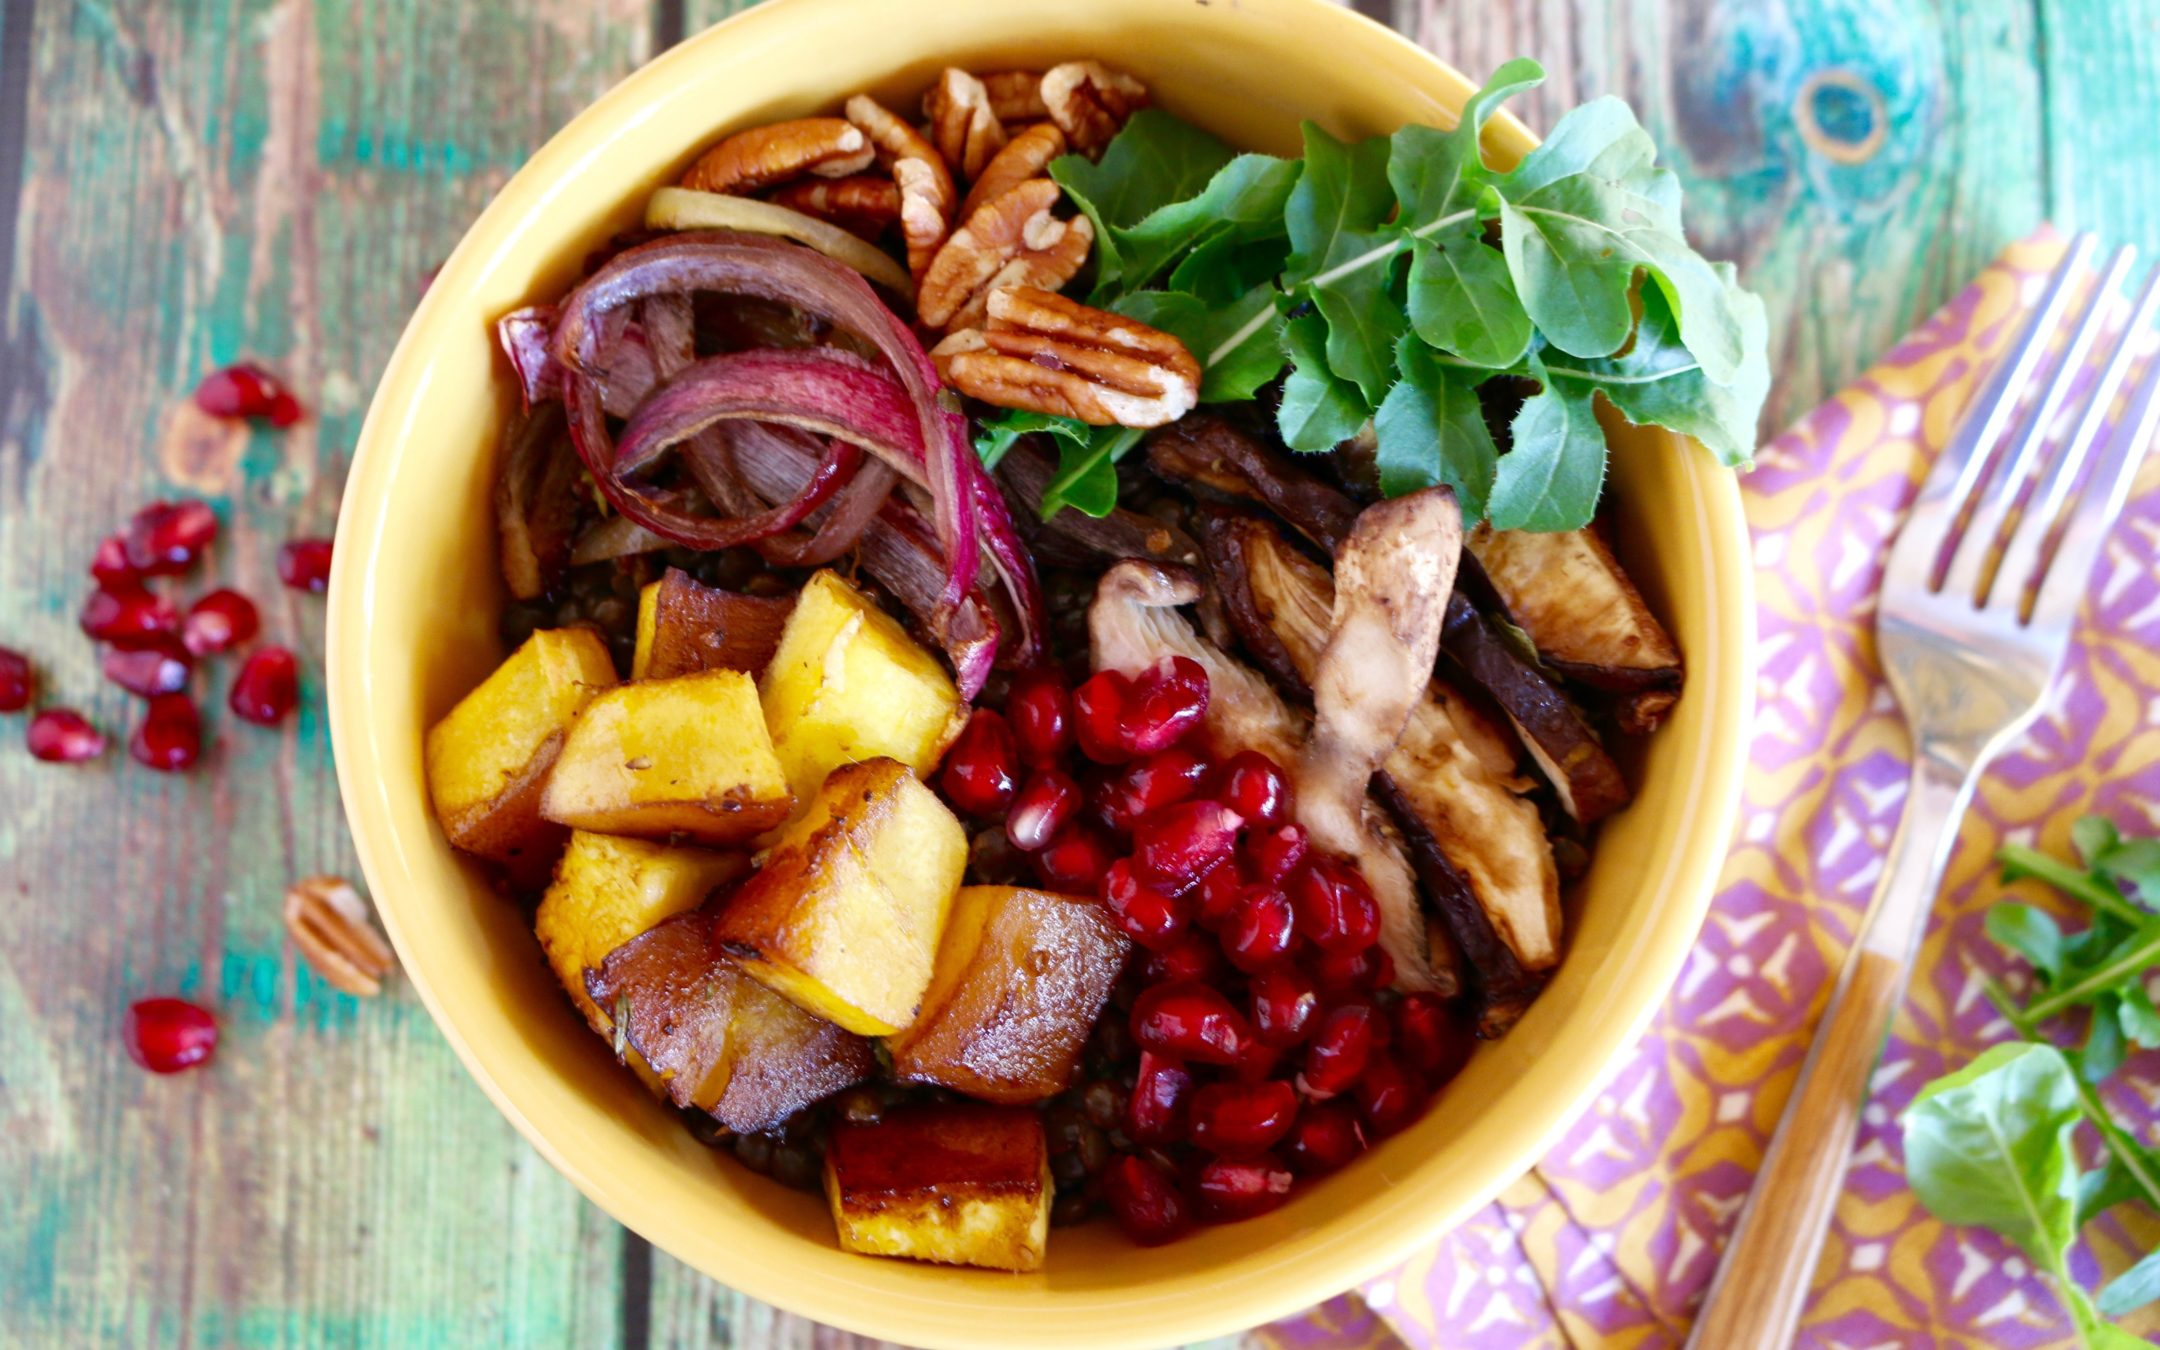 Nourish Lentil Bowl (Vegan, Gluten-Free)